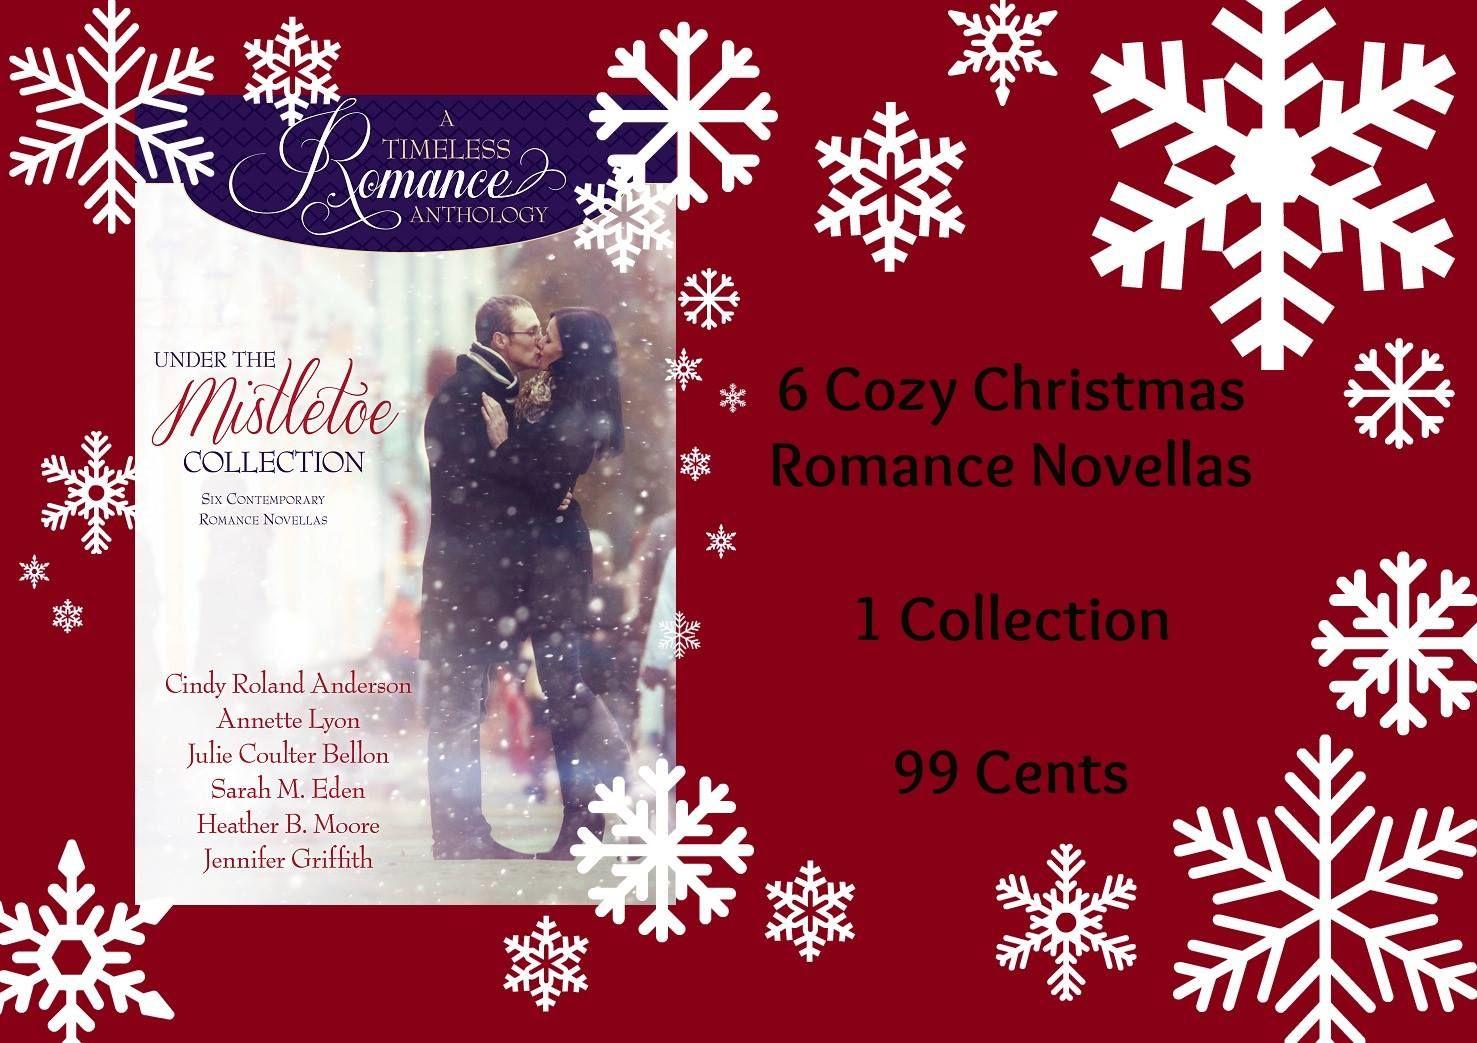 Under the Mistletoe Collection (A Timeless Romance